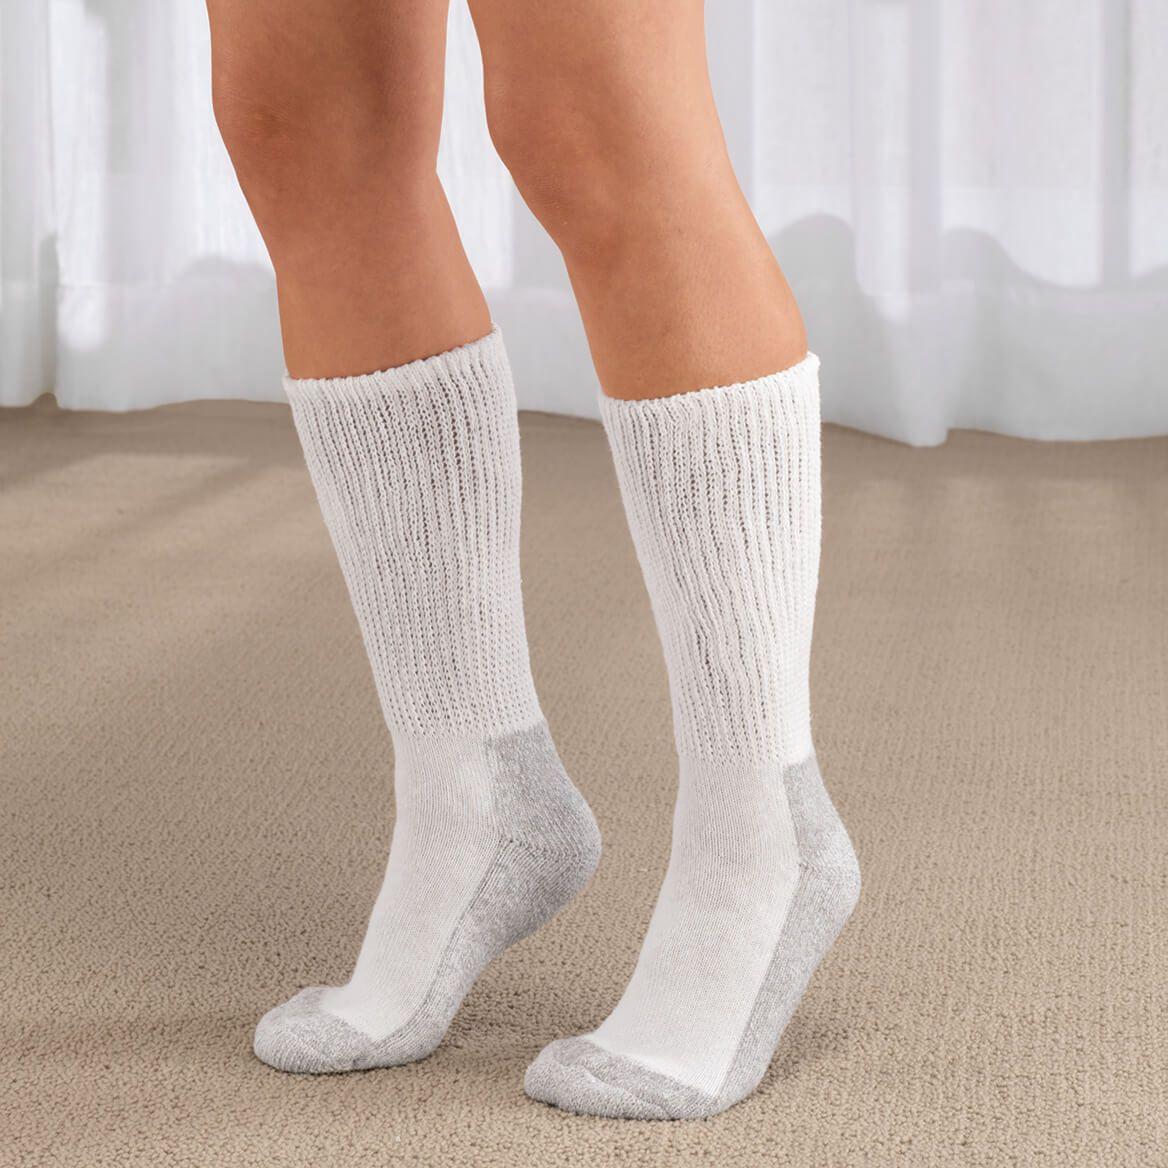 Men's Diabetic Socks - 2 Pair-304498